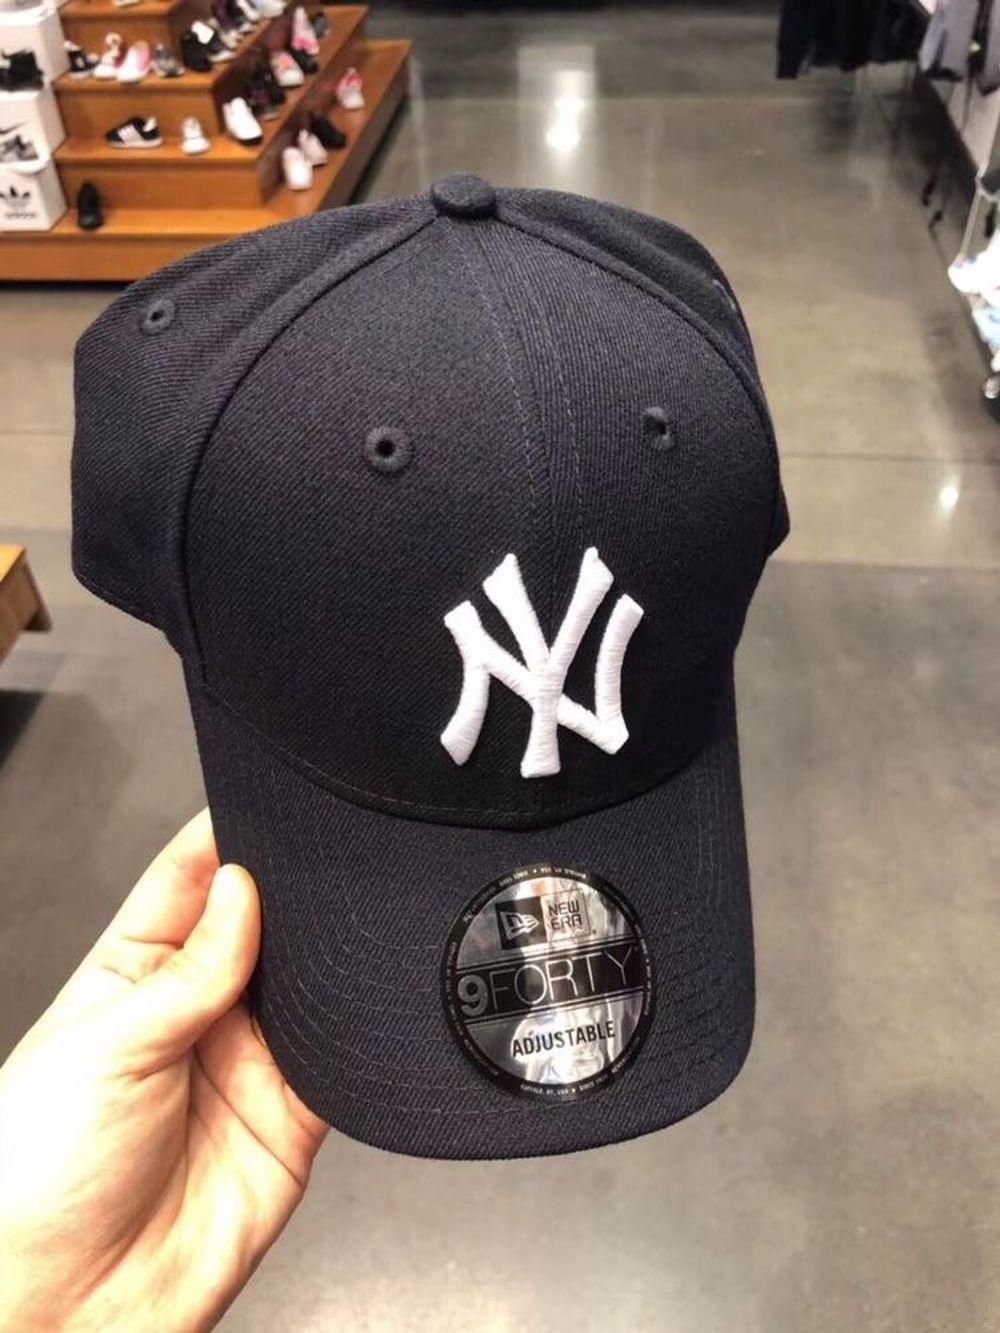 Yankees洋基男女同款 时尚弯檐帽休闲棒球帽多色可选